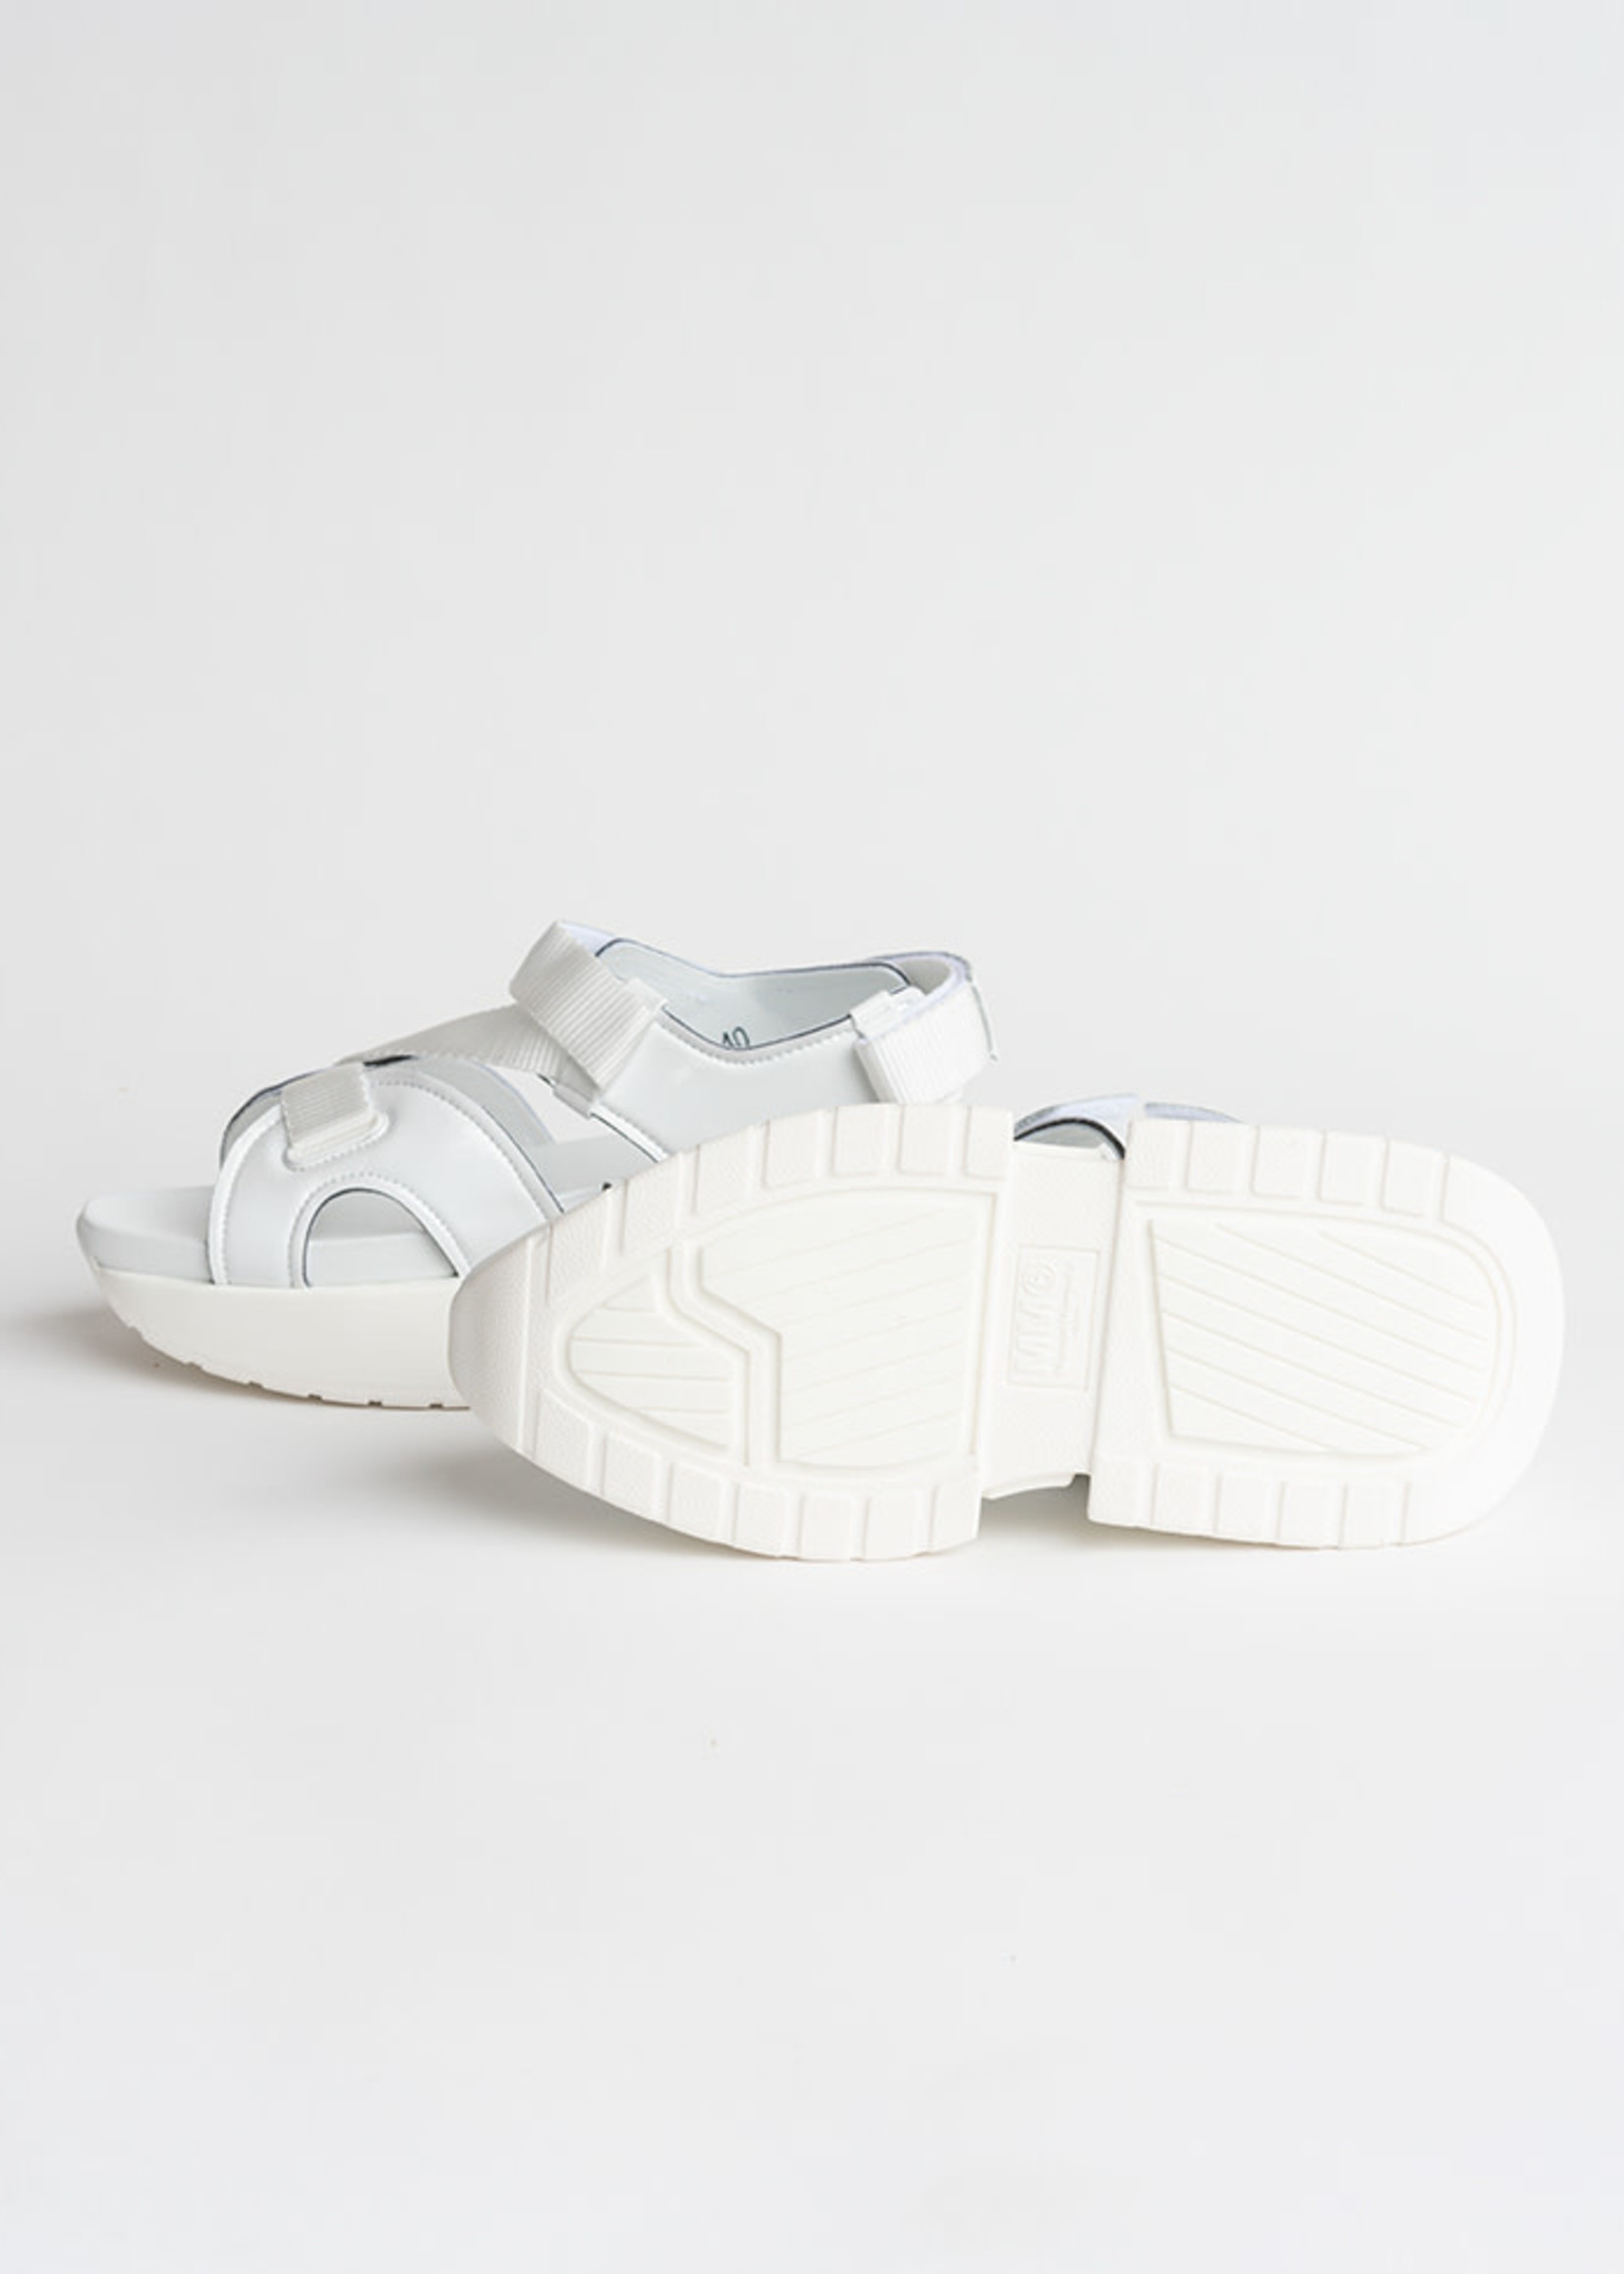 MM6 MAISON MARGIELA White Multi Strap Sandal